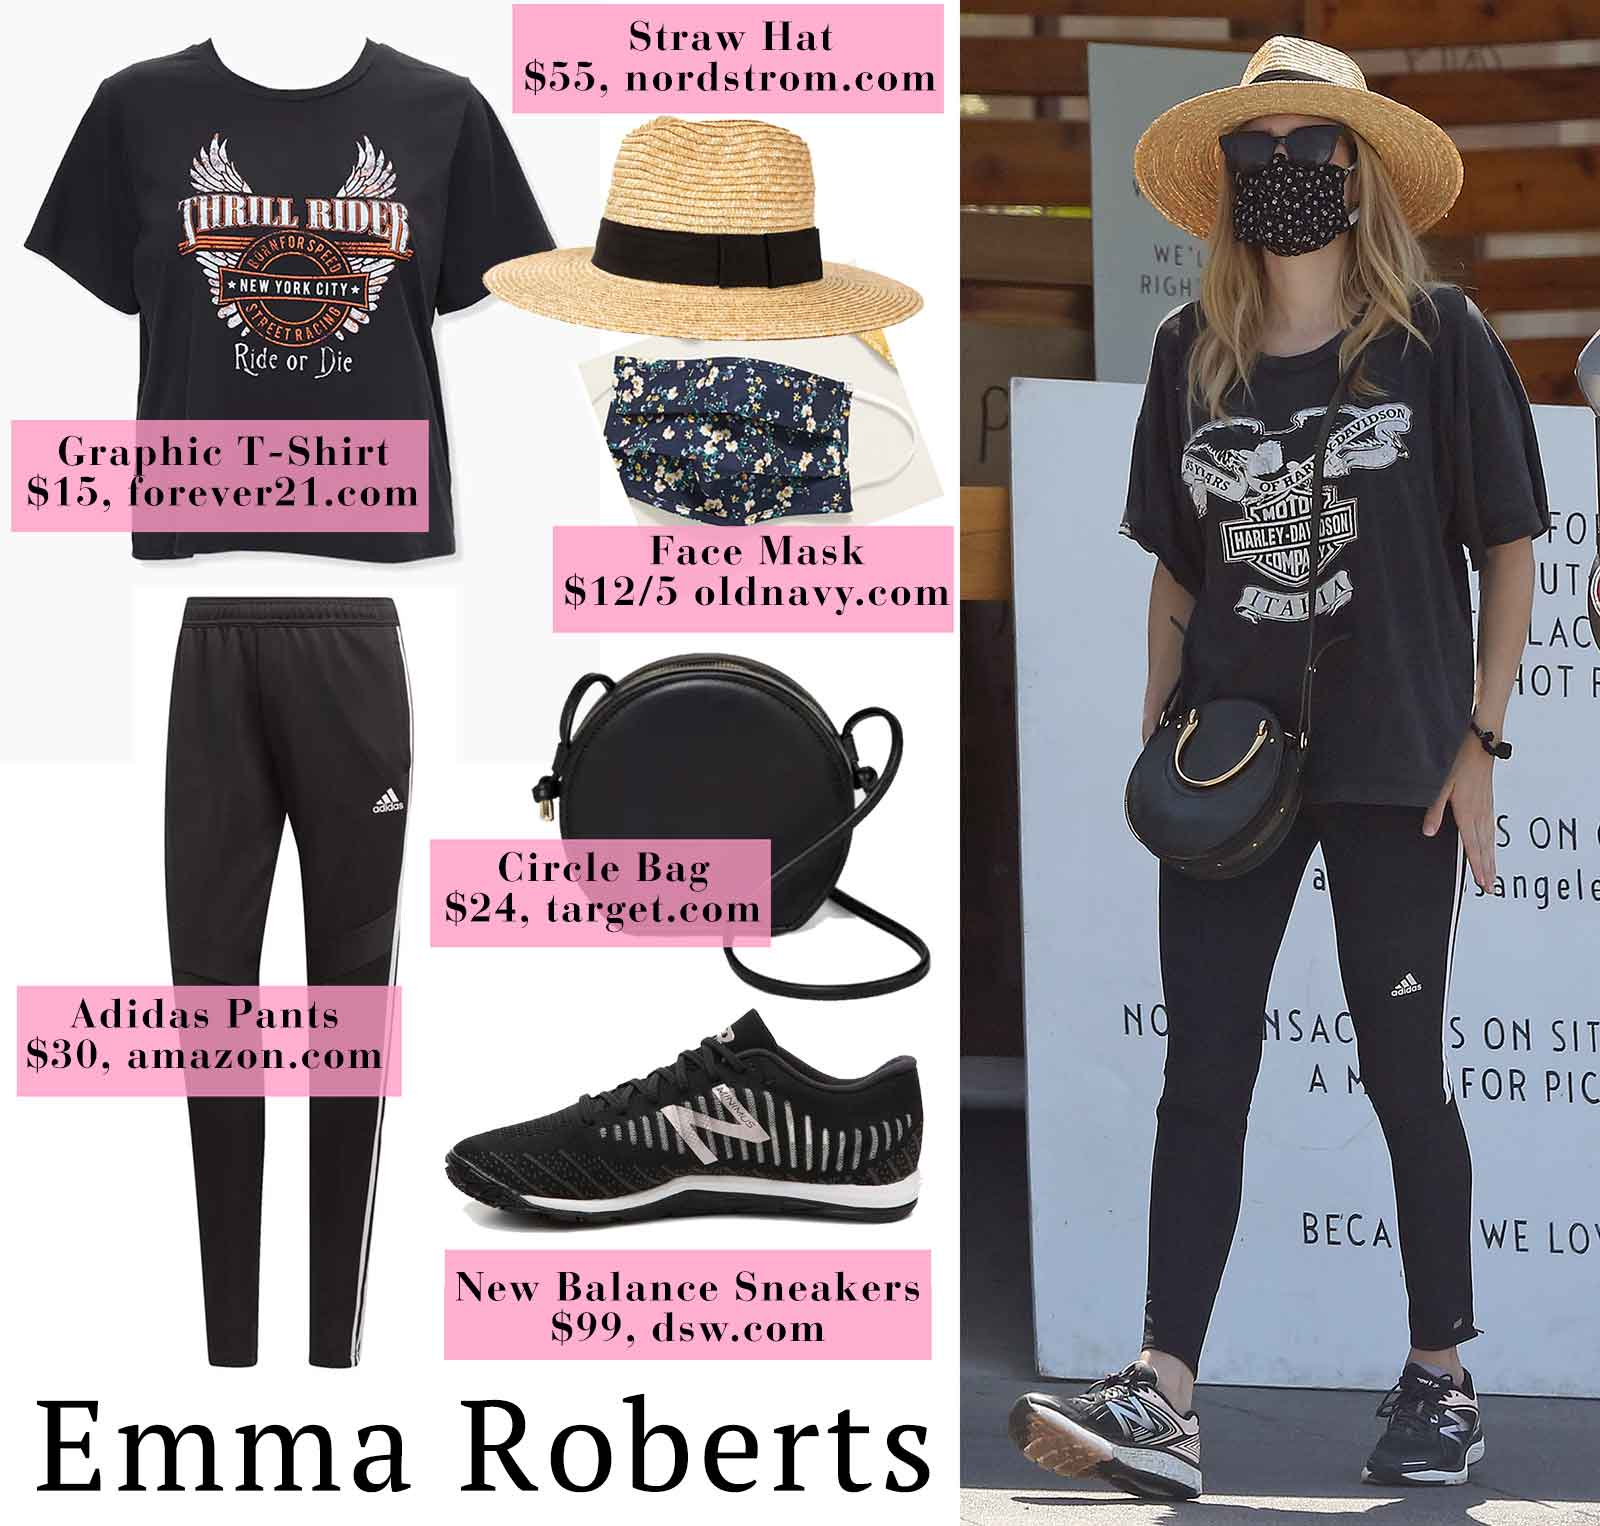 Photo of Emma Roberts Harley Davidson Shirt and New Balance Sneakers